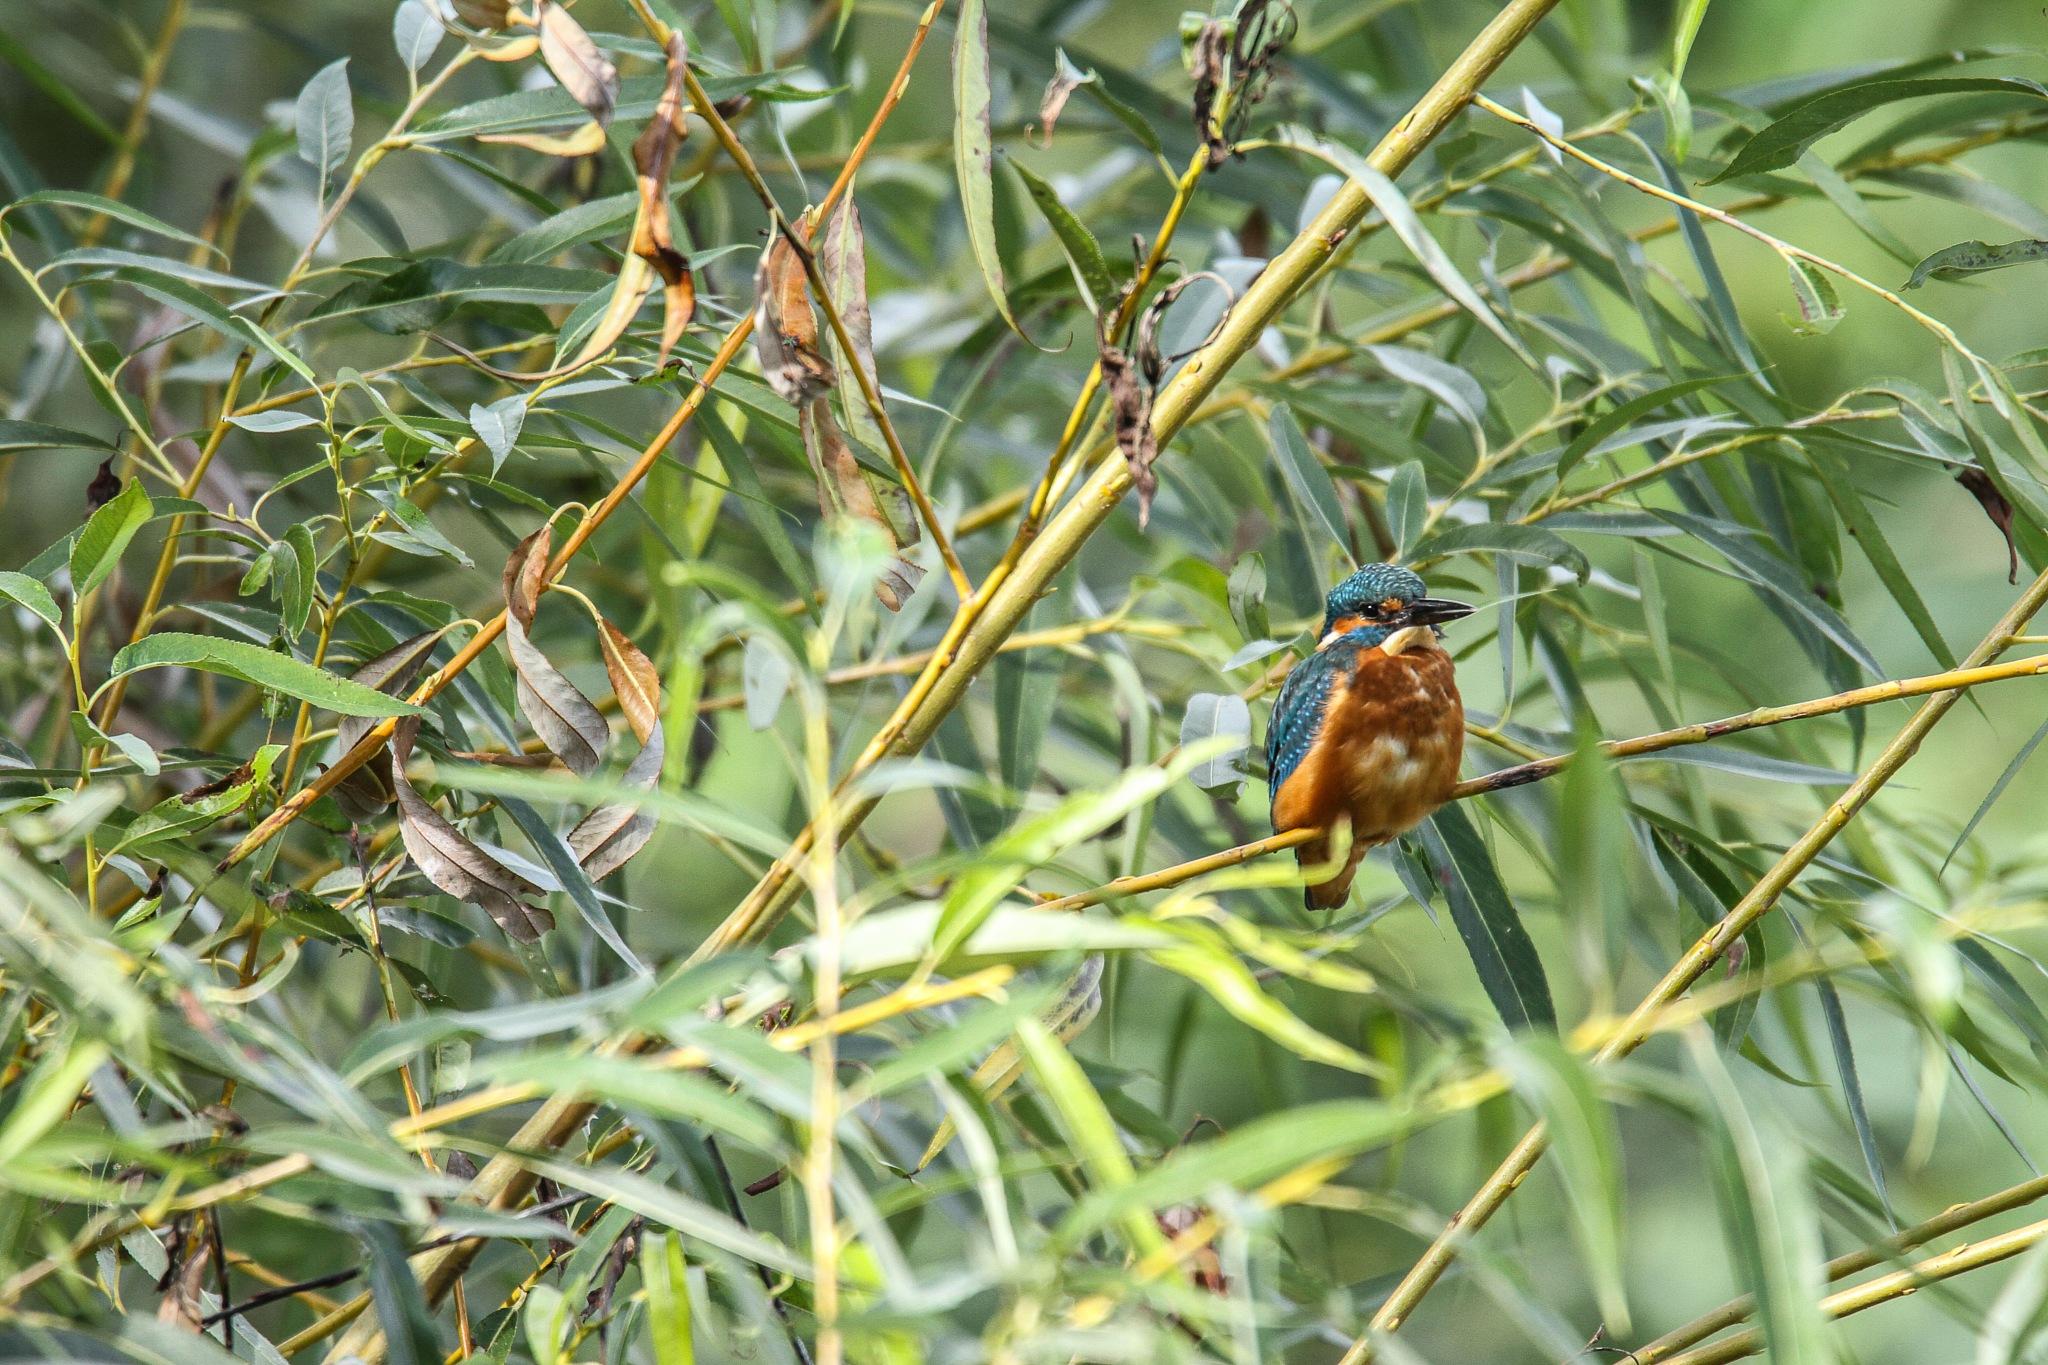 Juvenile kingfisher by garry-chisholm1